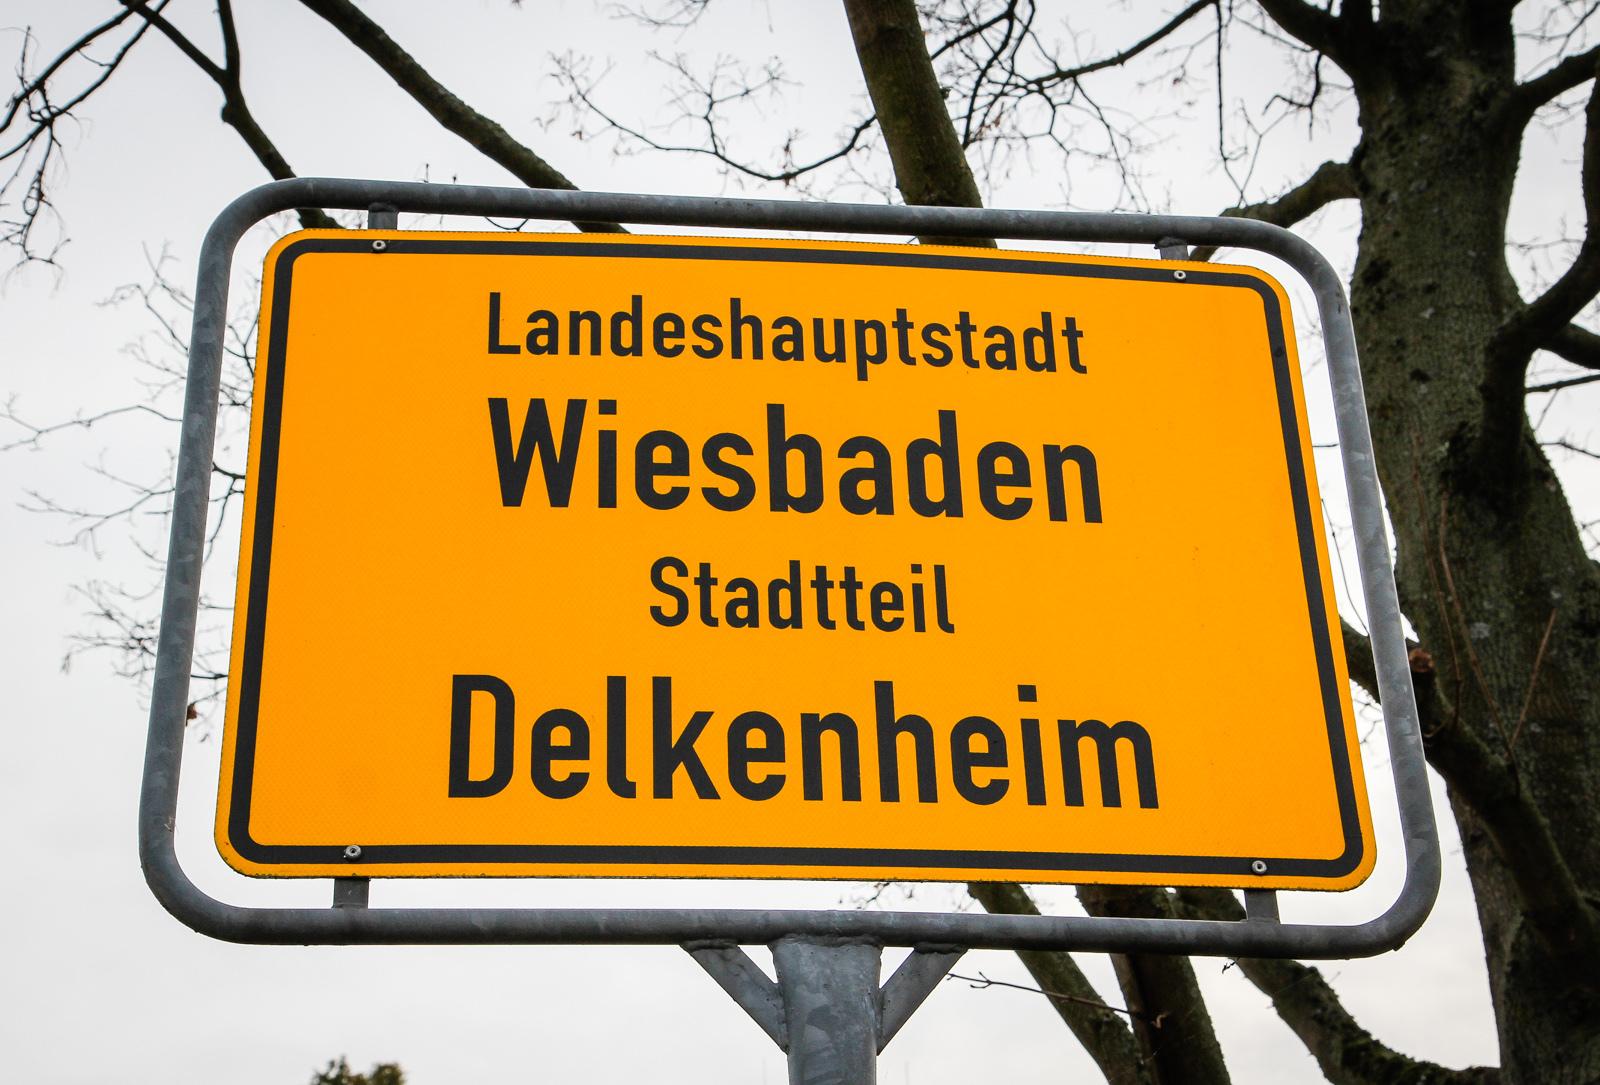 Delkenheim - Ortsschild